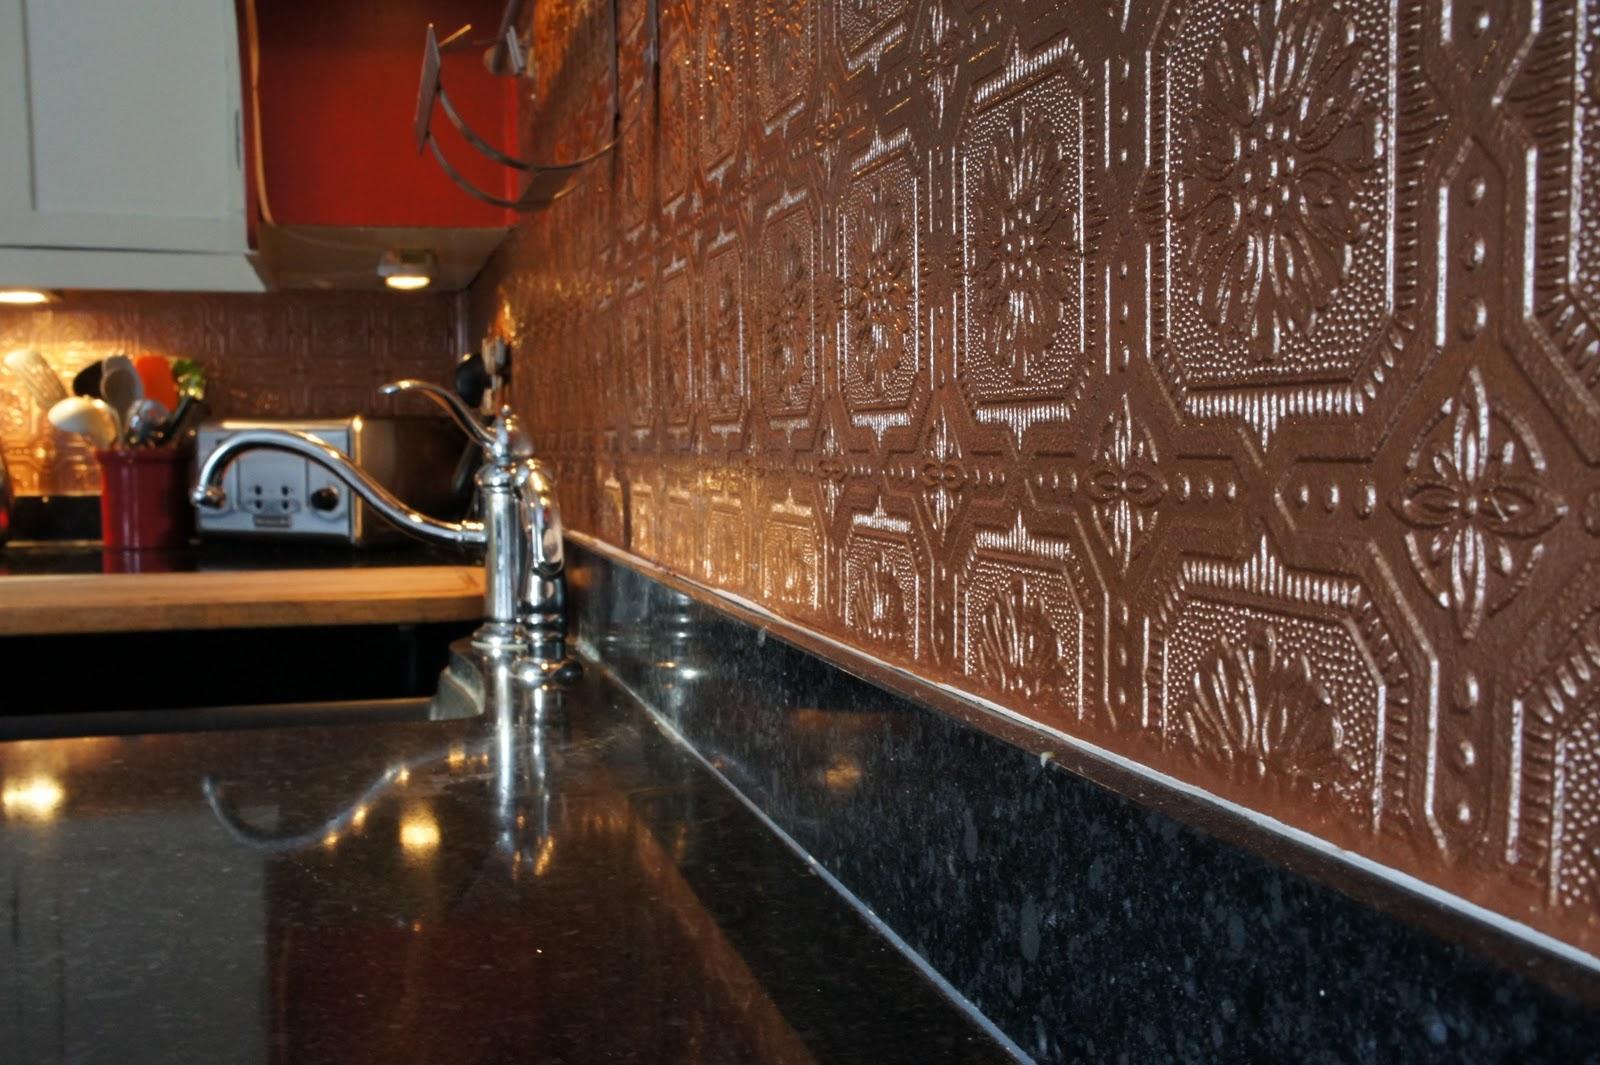 wwwpicswallpapercomdownloadkitchen backsplash raised wallpaper 1600x1065